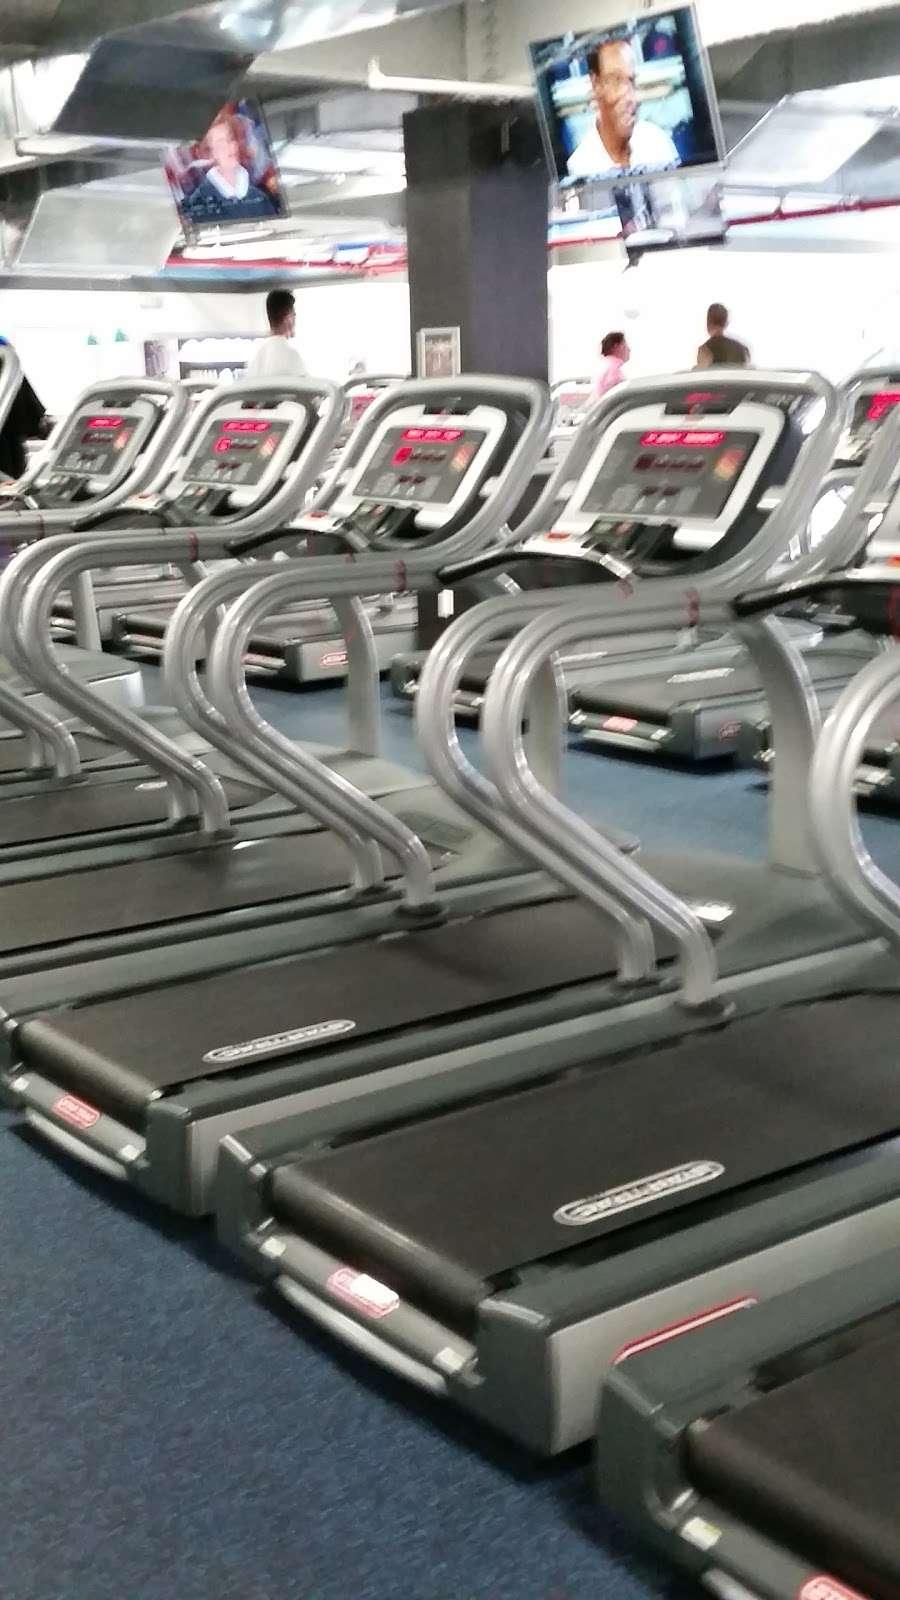 Crunch Fitness - Richmond Hill - gym  | Photo 7 of 10 | Address: 115-02 Jamaica Ave, Richmond Hill, NY 11418, USA | Phone: (646) 780-2050